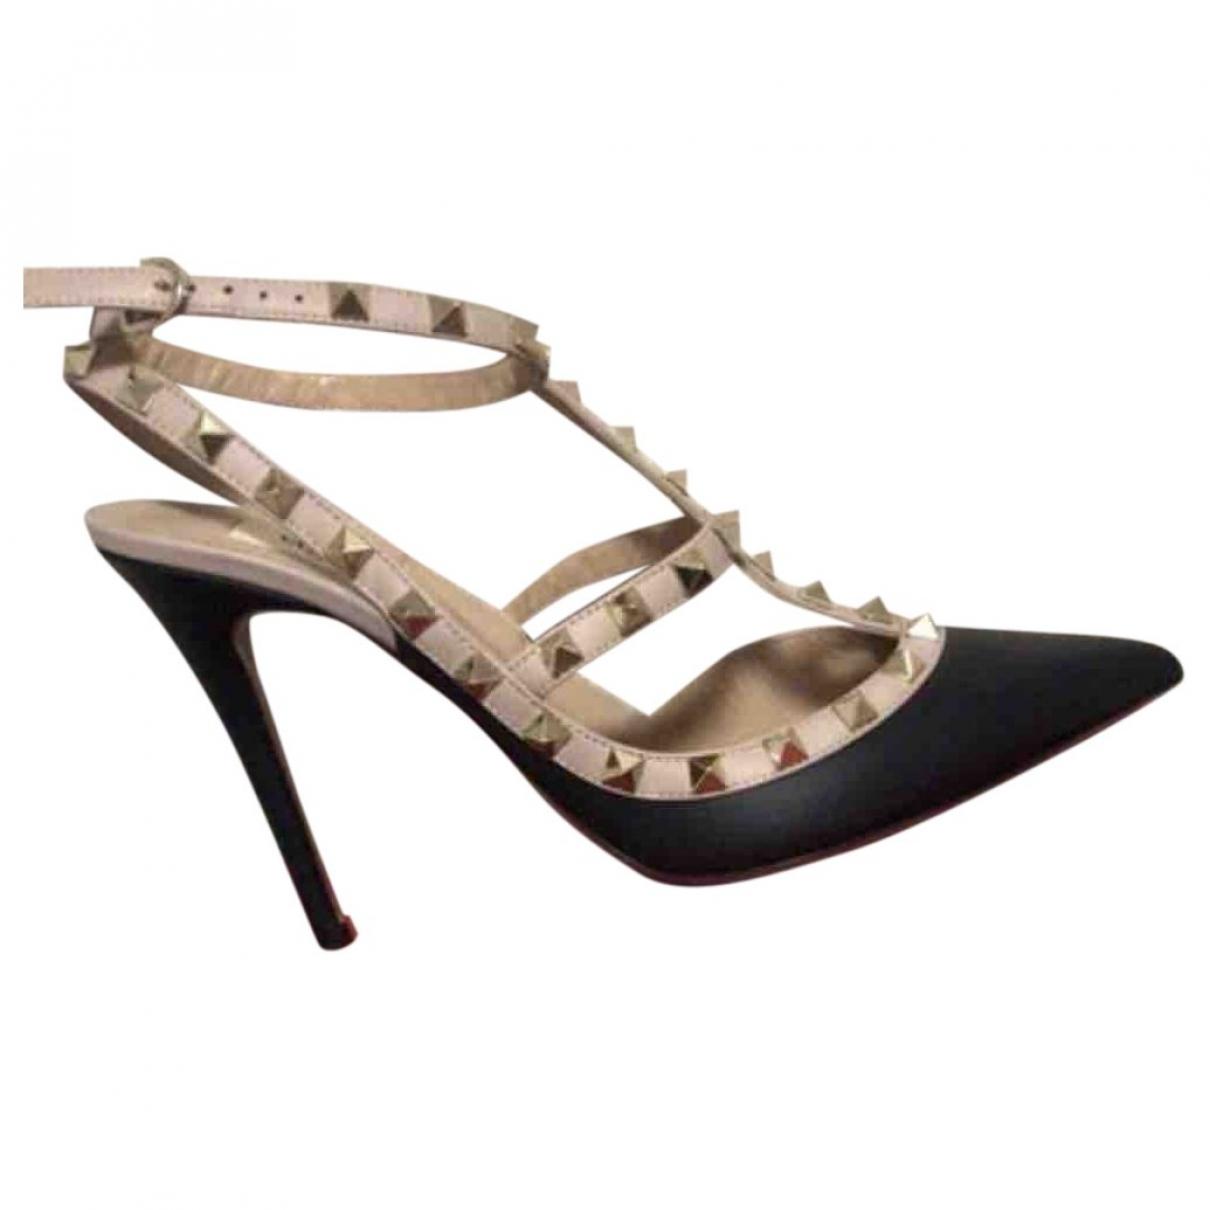 Valentino Garavani Rockstud Black Pony-style calfskin Heels for Women 39 EU